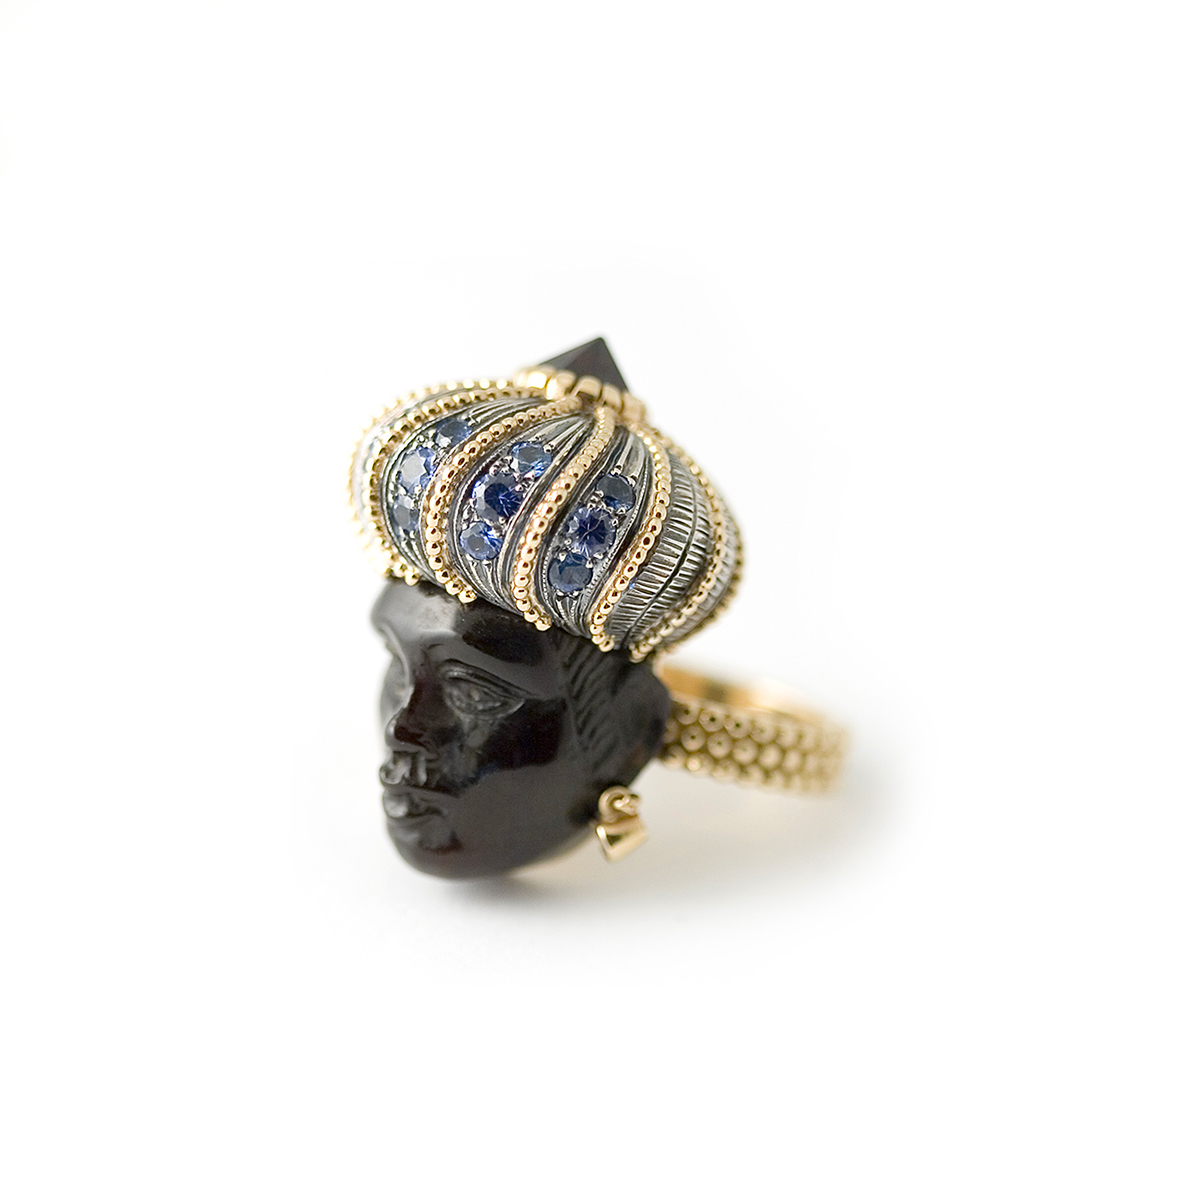 Morettone ring